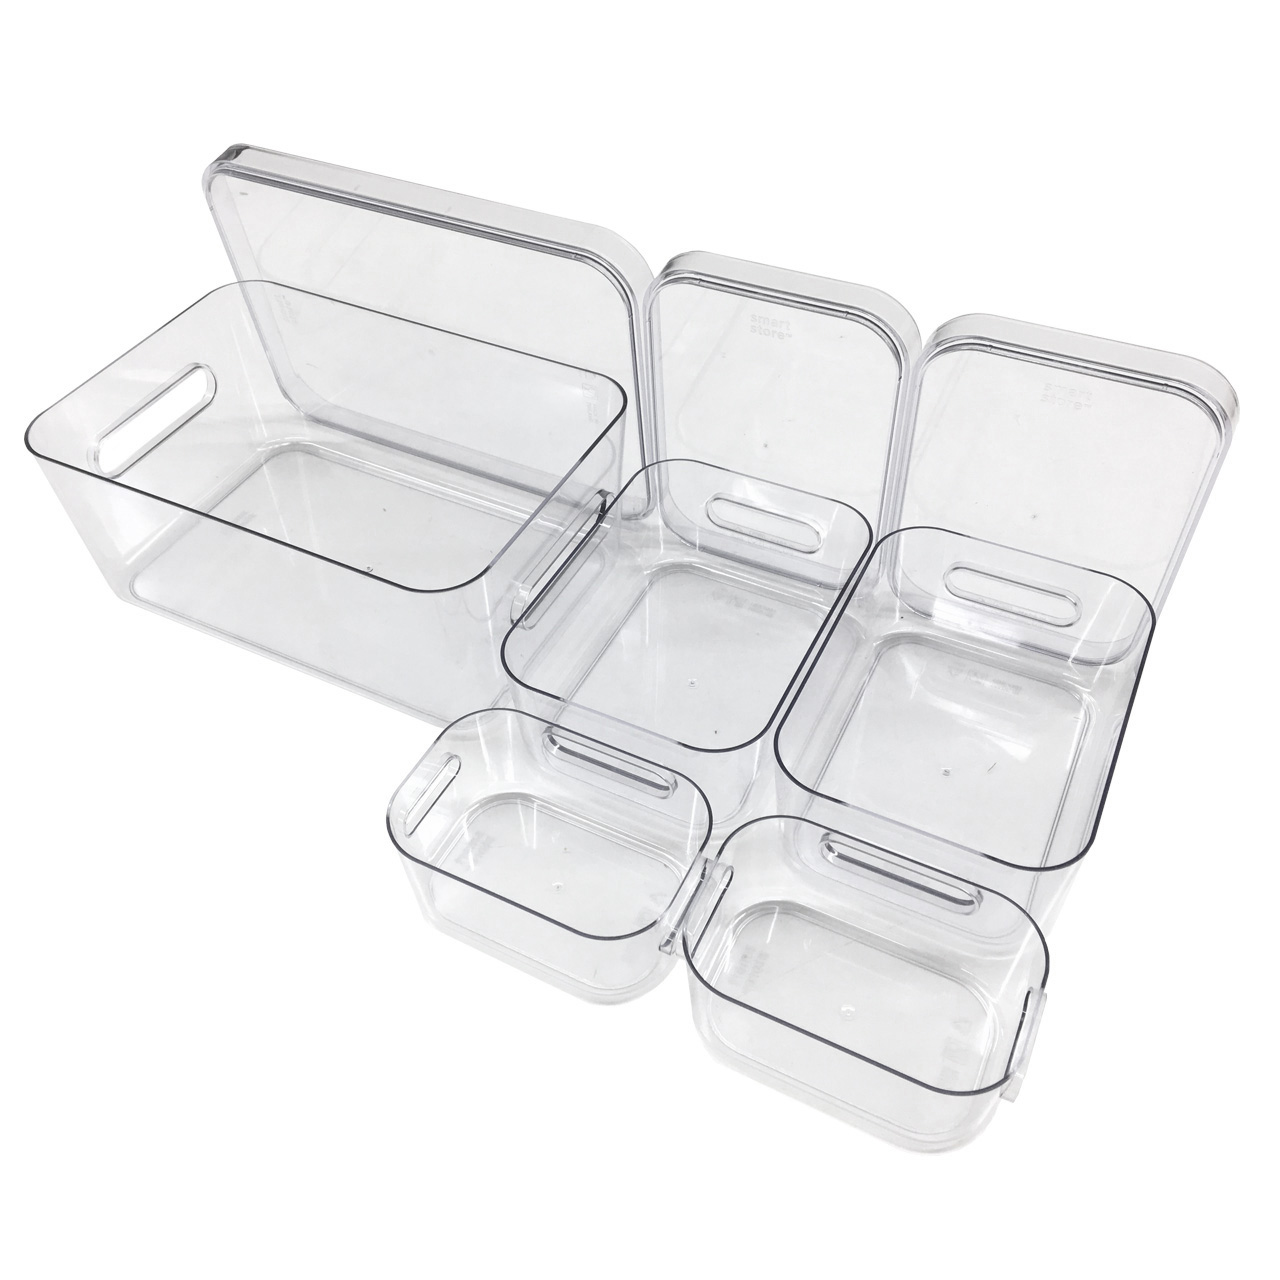 Kühlschrank Organizer Boxen-Set mit Beschriftungsetiketten (Mixed-8er-Set inkl. Deckel)